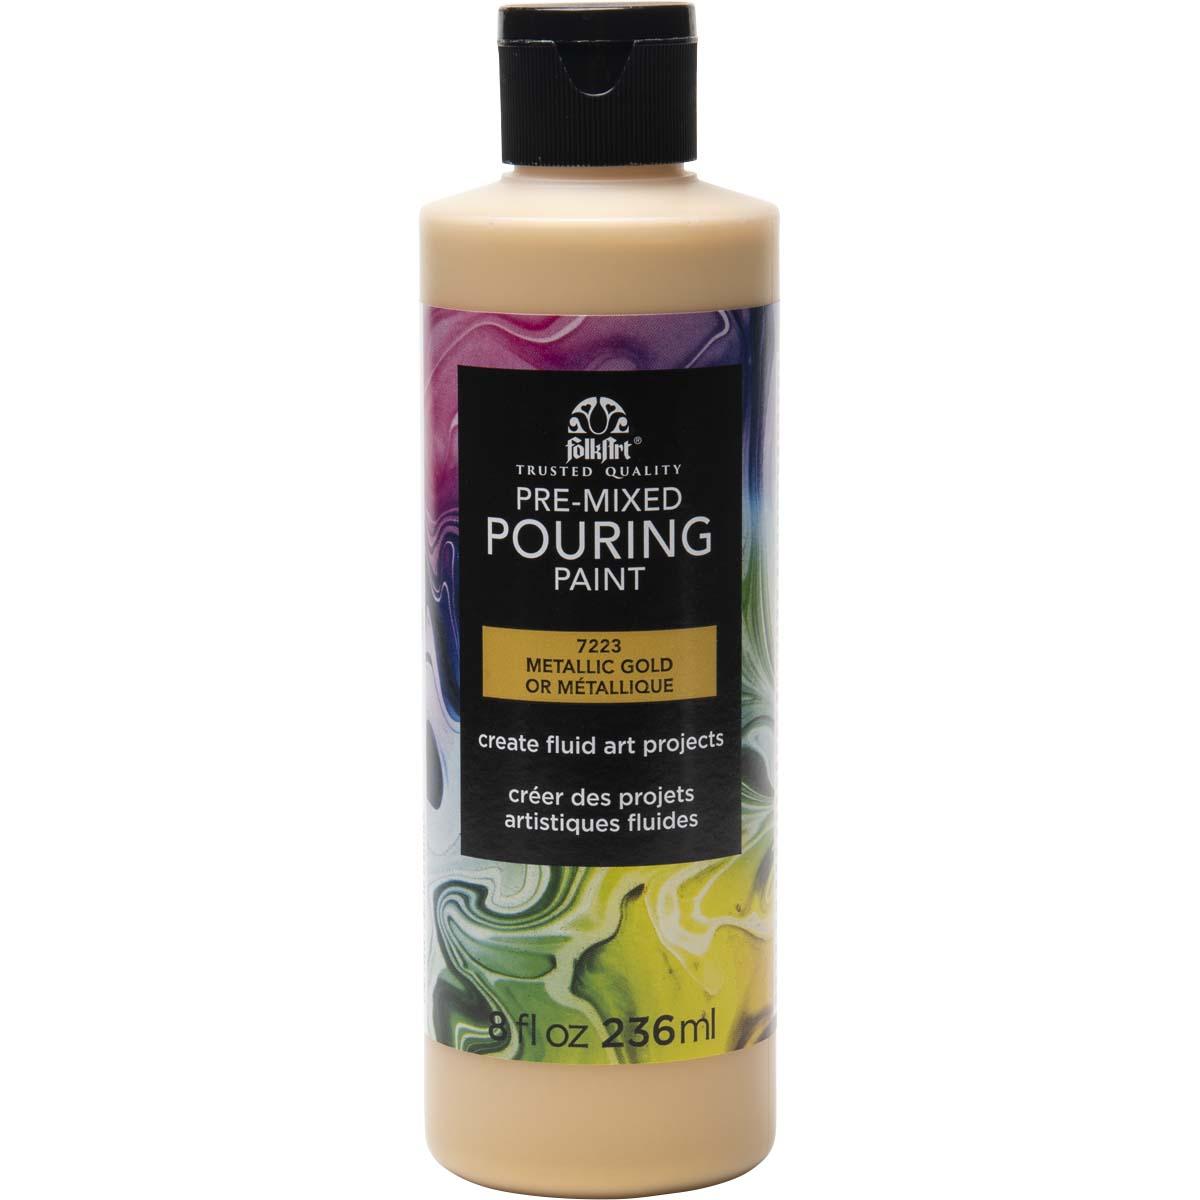 FolkArt ® Pre-mixed Pouring Paint - Metallic Gold, 8 oz. - 7223